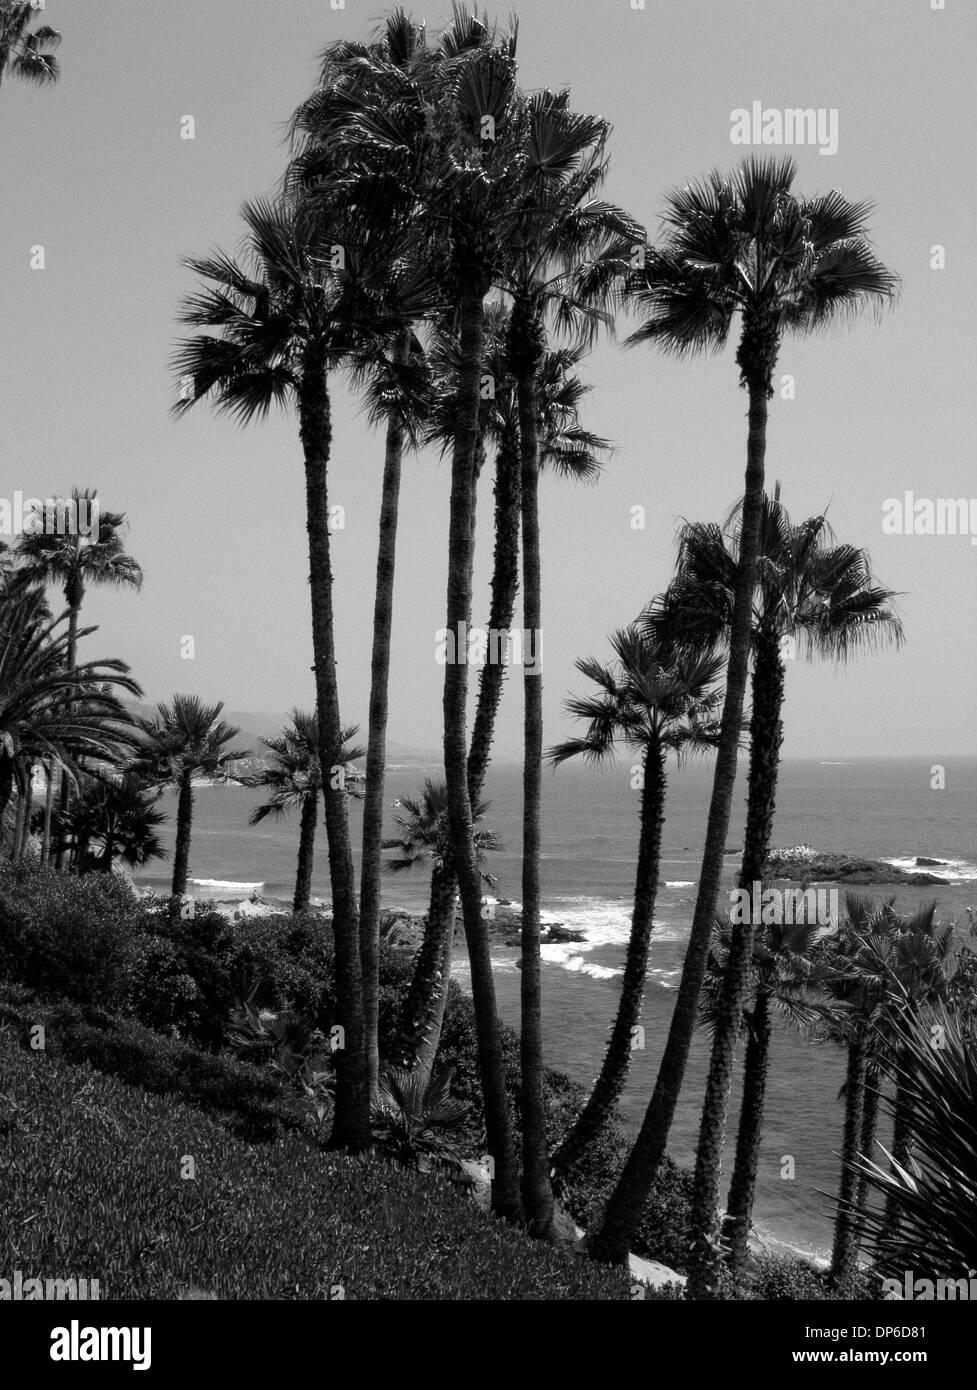 Sep 23, 2006; Laguna Beach, CA, USA; Laguna Beach is a city located in southern Orange County, California. Laguna Stock Photo